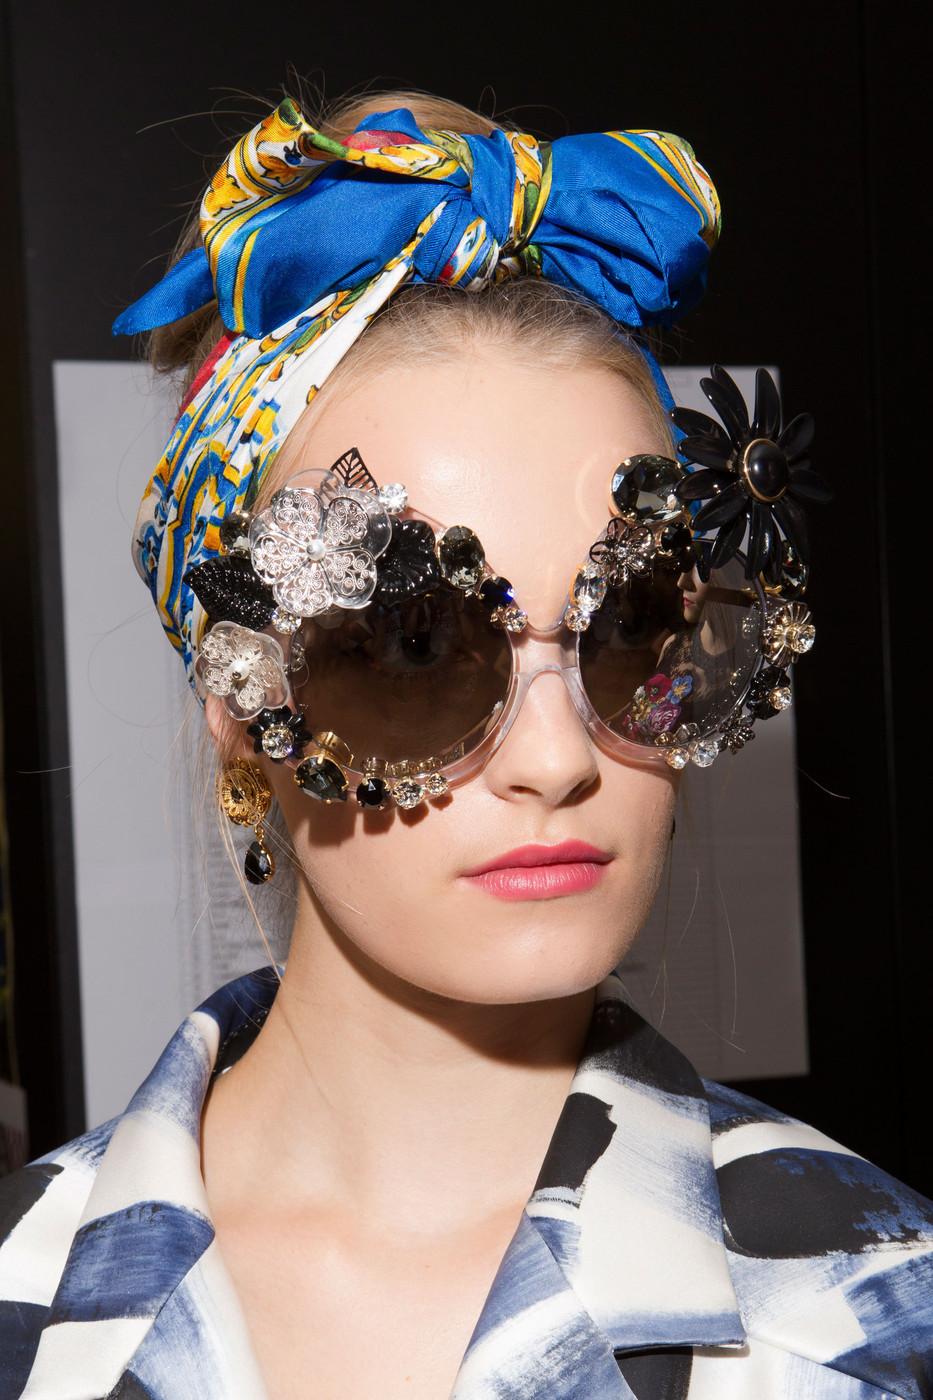 Dolce+Gabbana+Spring+2016+Backstage+QHgfvM8OywNx.jpg